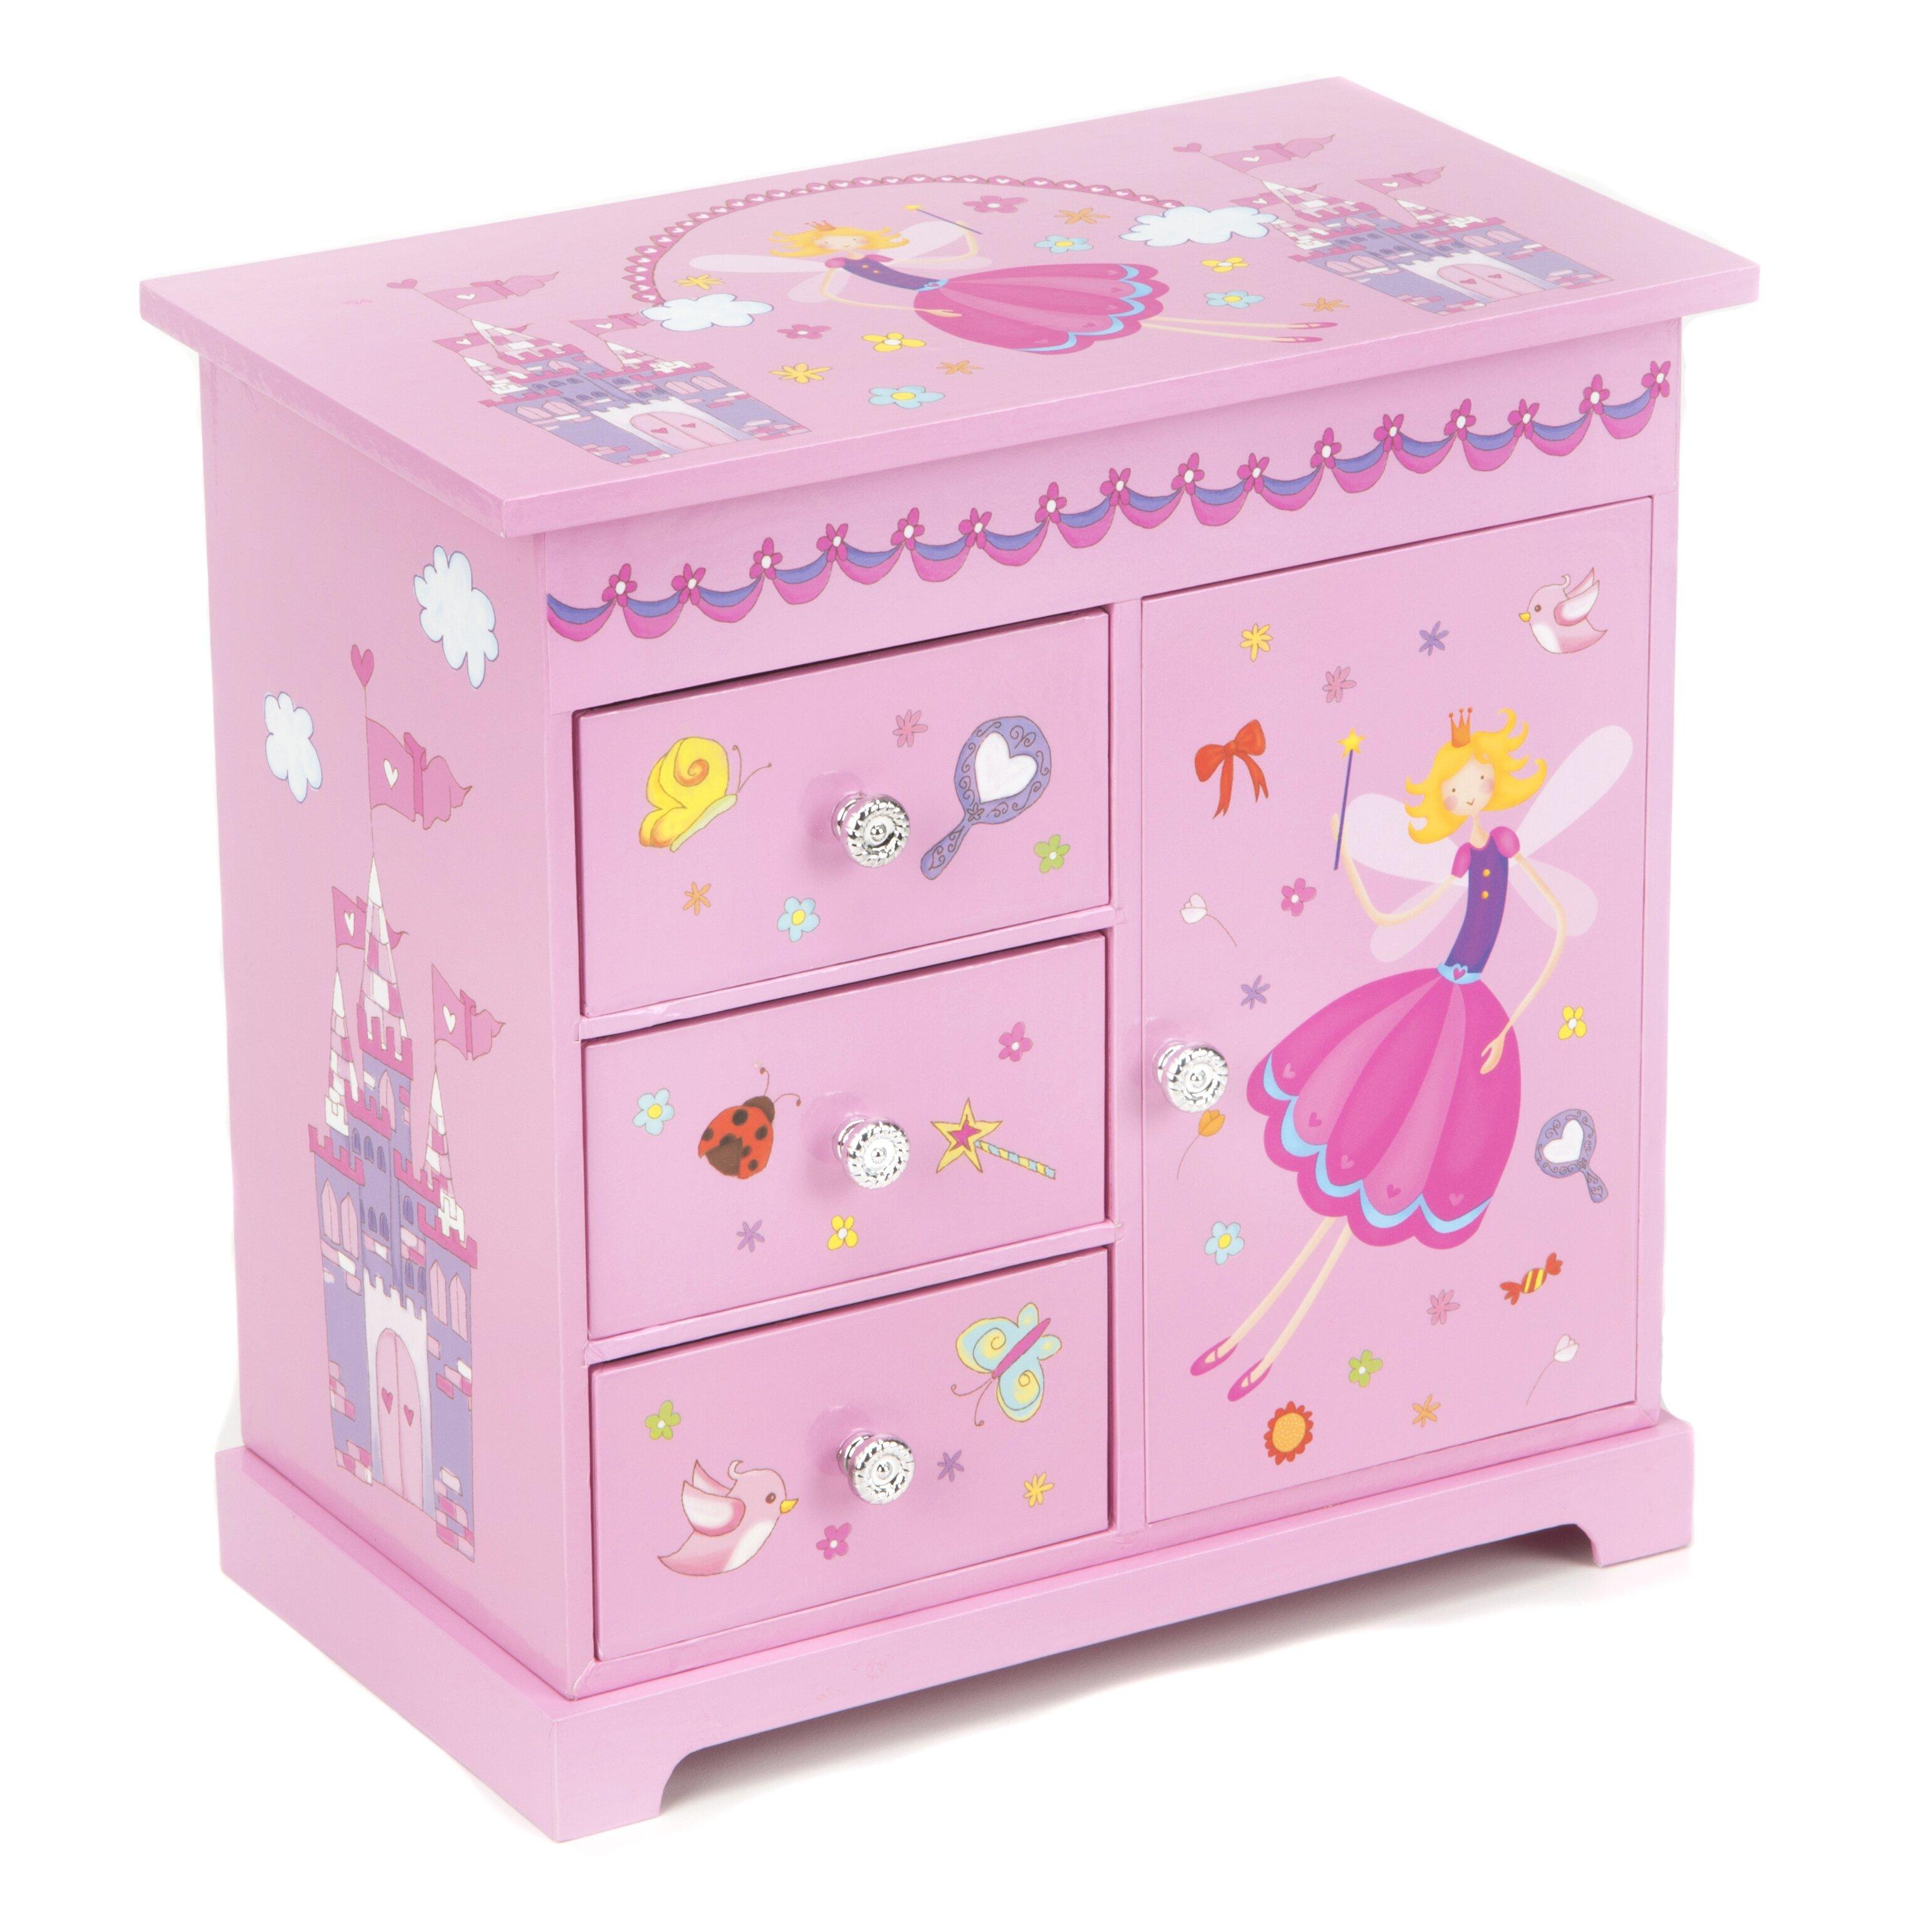 Zoomie Kids Musical Ballerina Jewelry Box & Reviews   Wayfair